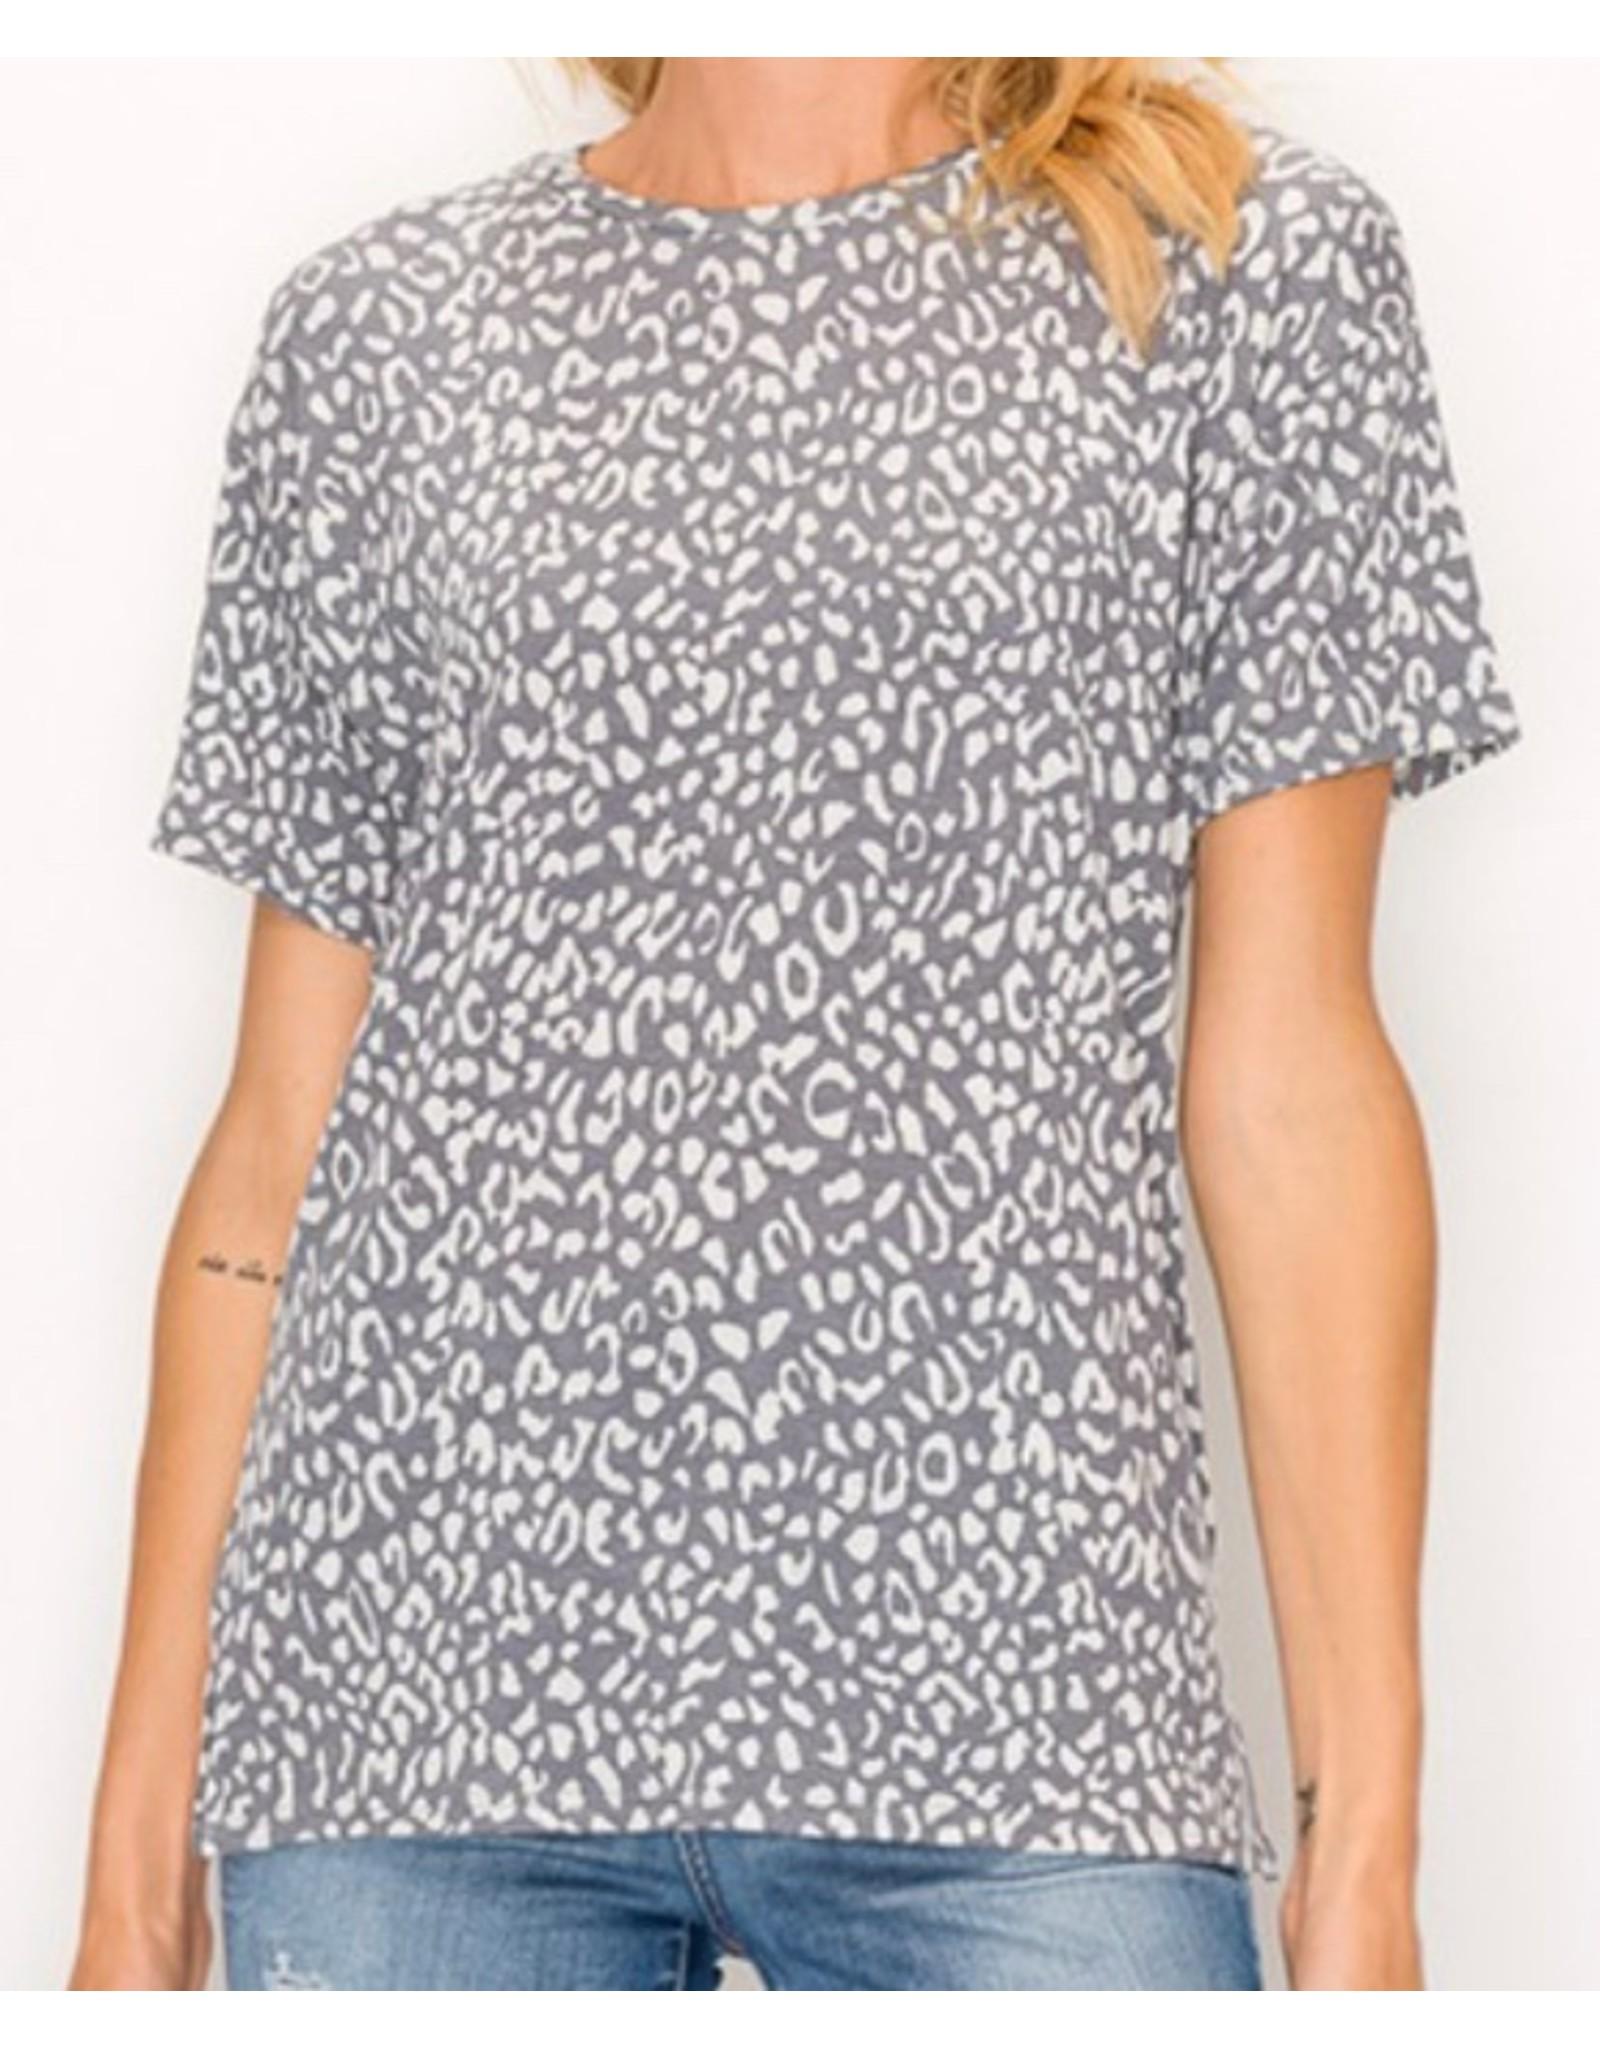 LATA Leopard Print S/S w/ Side Slit